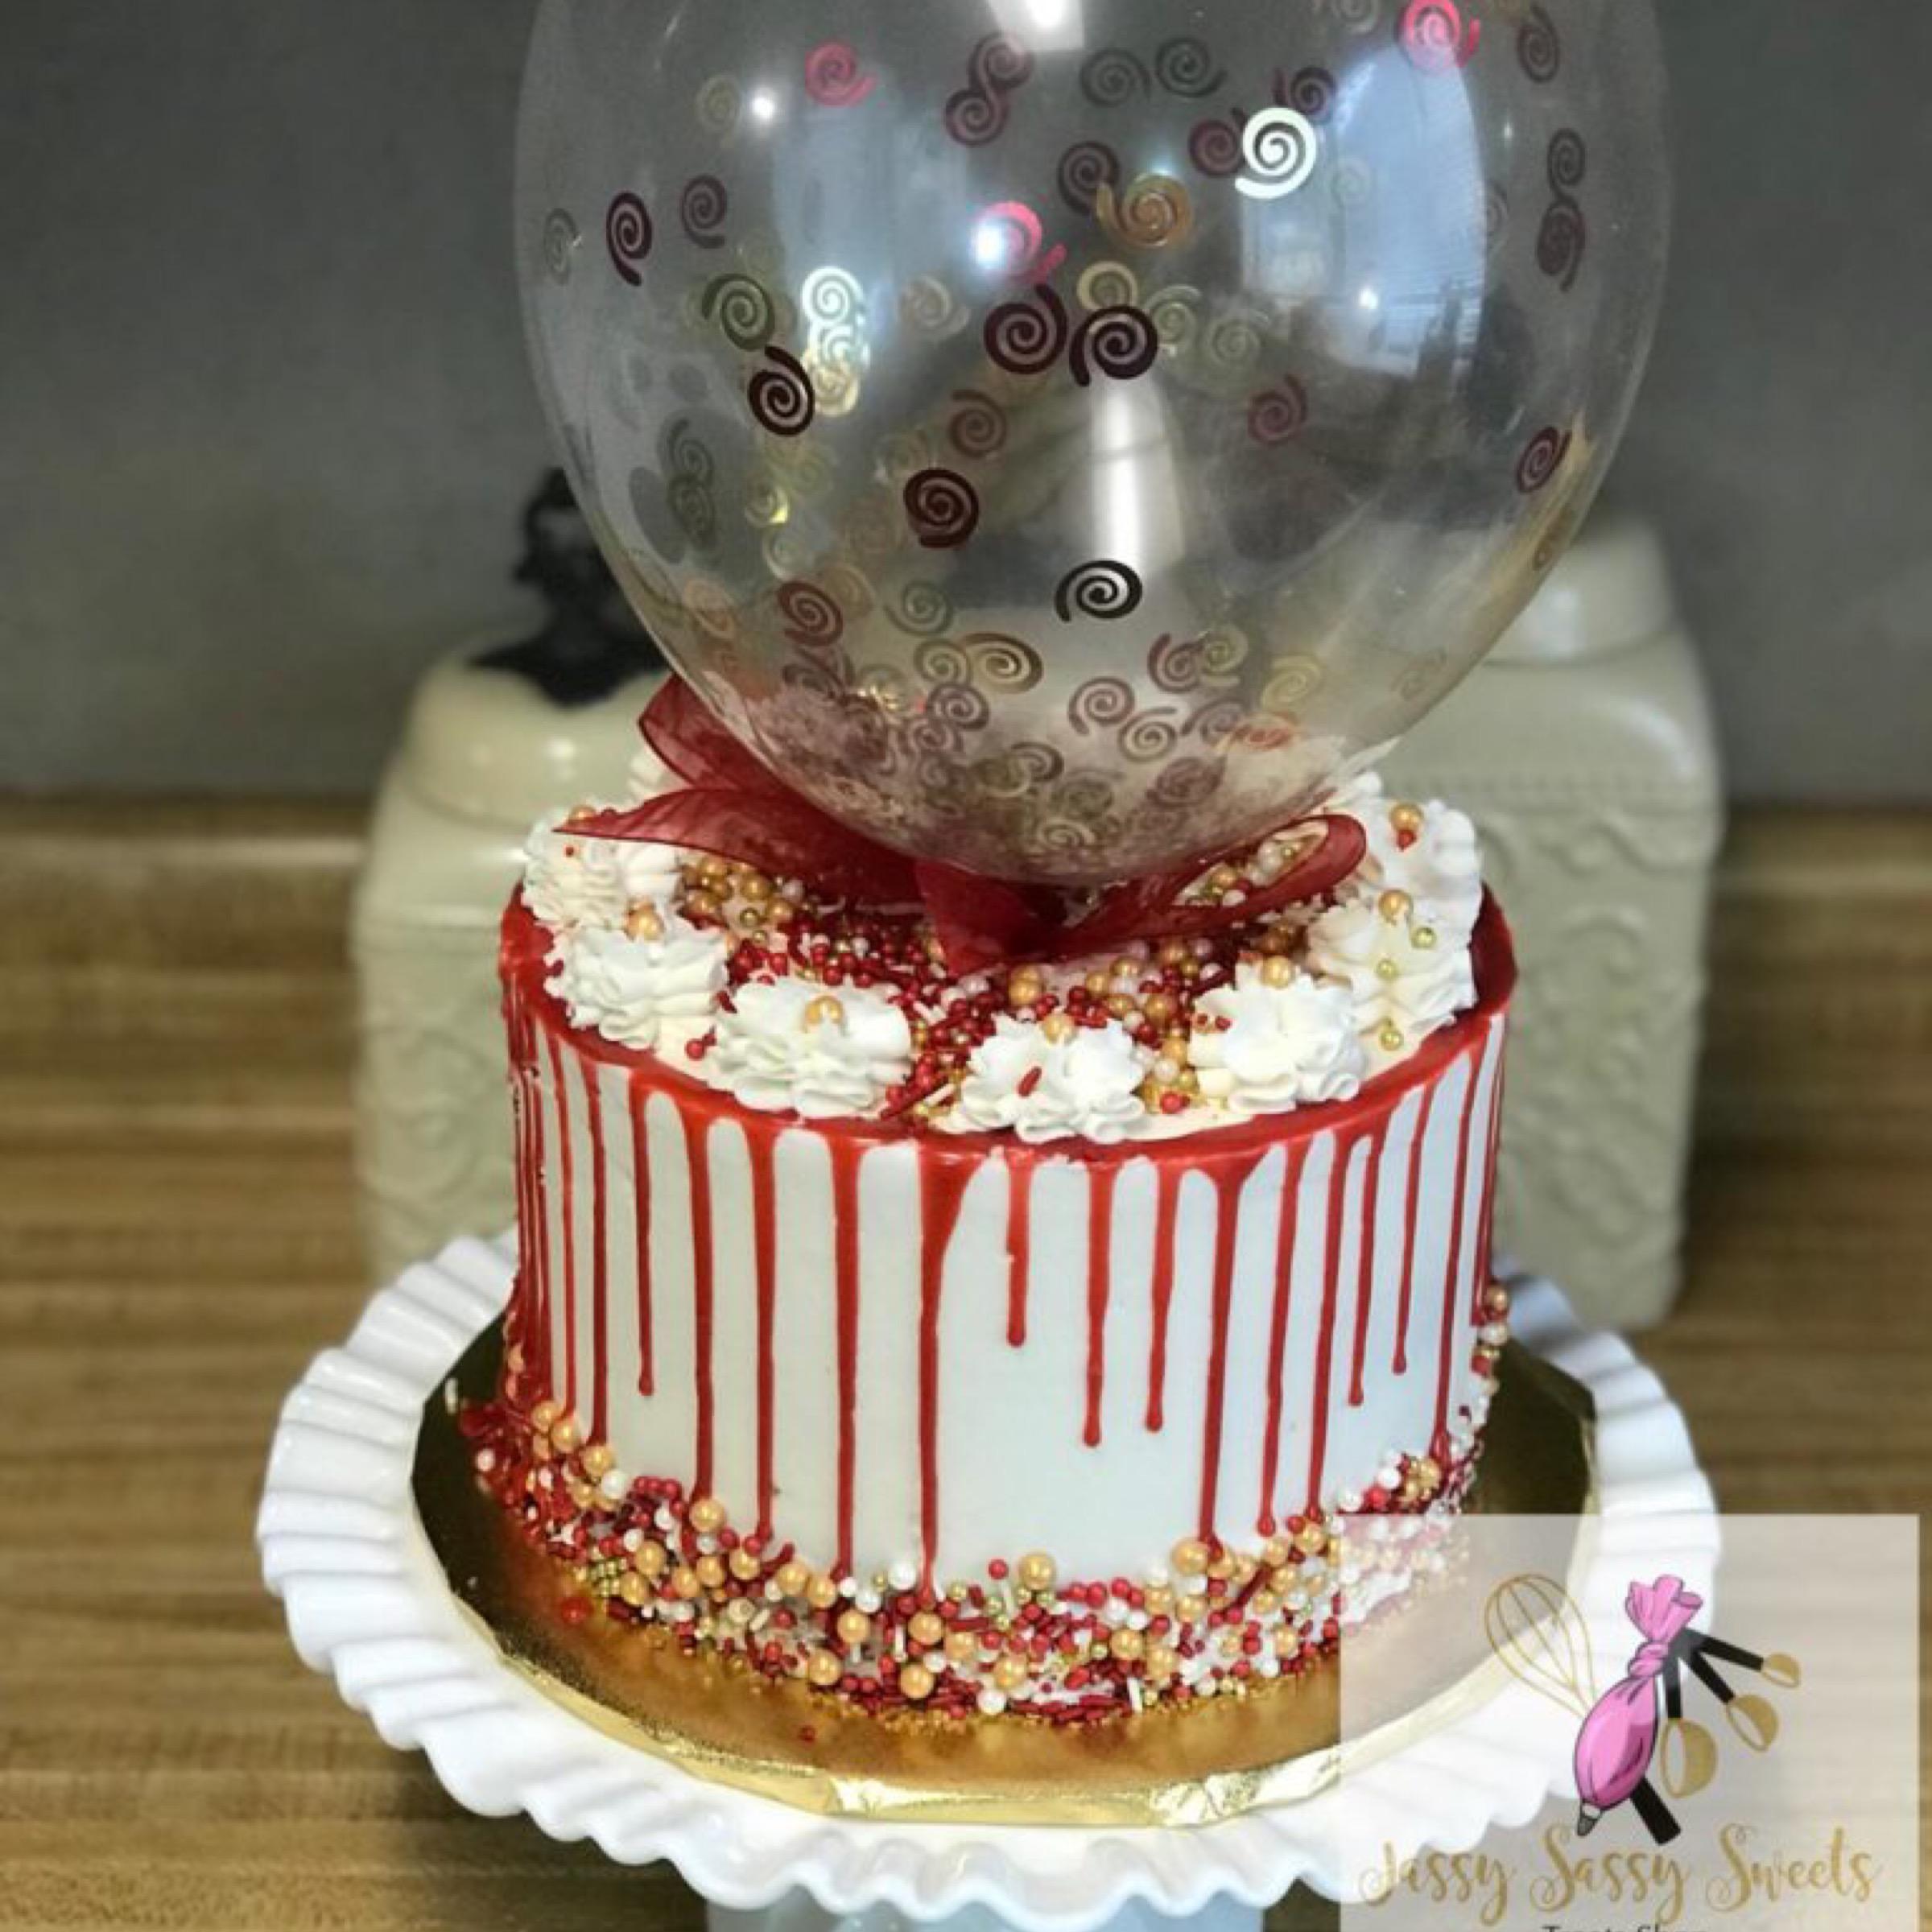 Balloon Cake made by Jassy Sassy Sweets